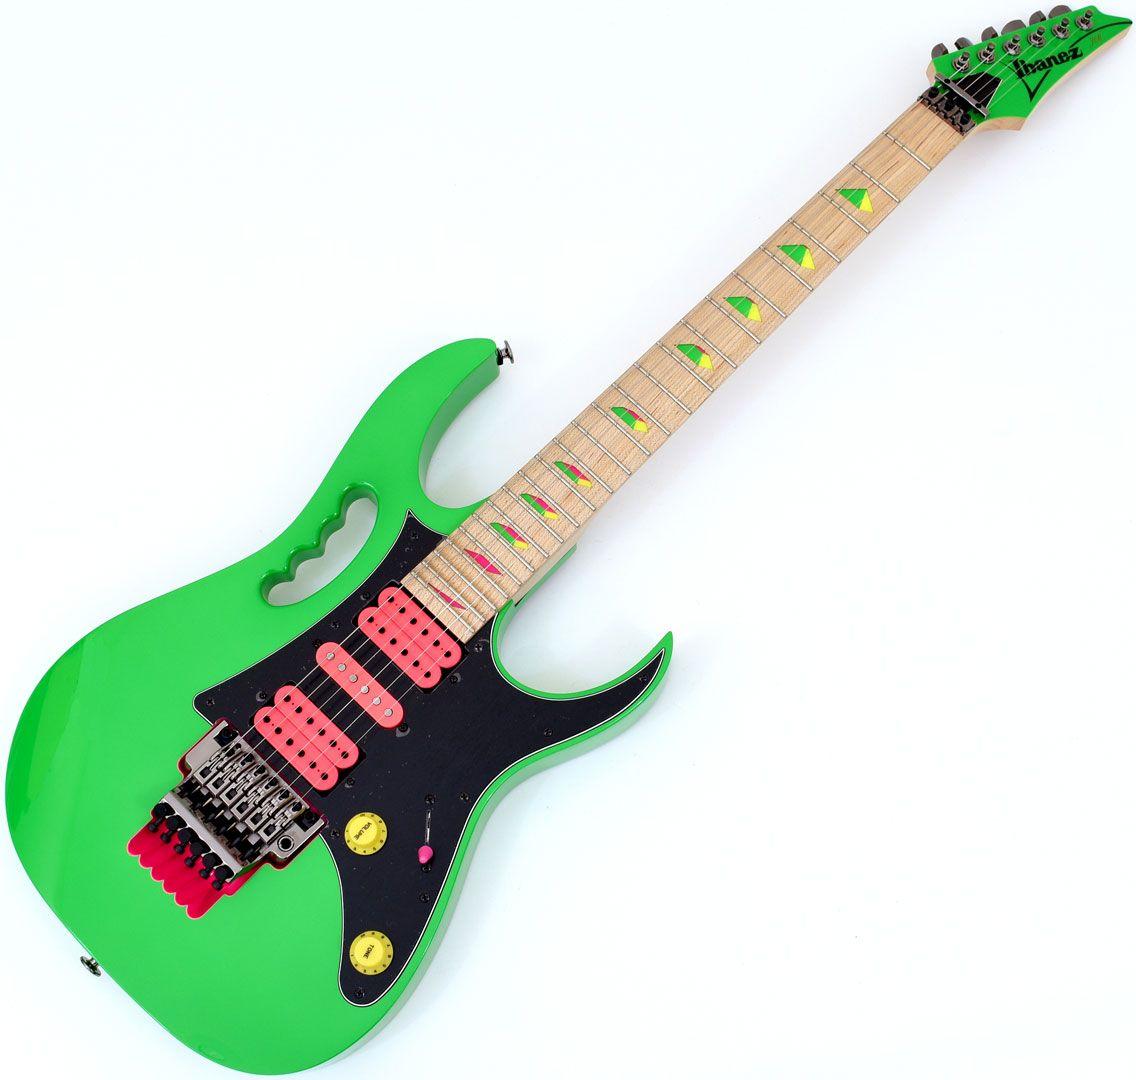 ibanez steve vai signature jem777 electric guitar loch ness green je. Black Bedroom Furniture Sets. Home Design Ideas